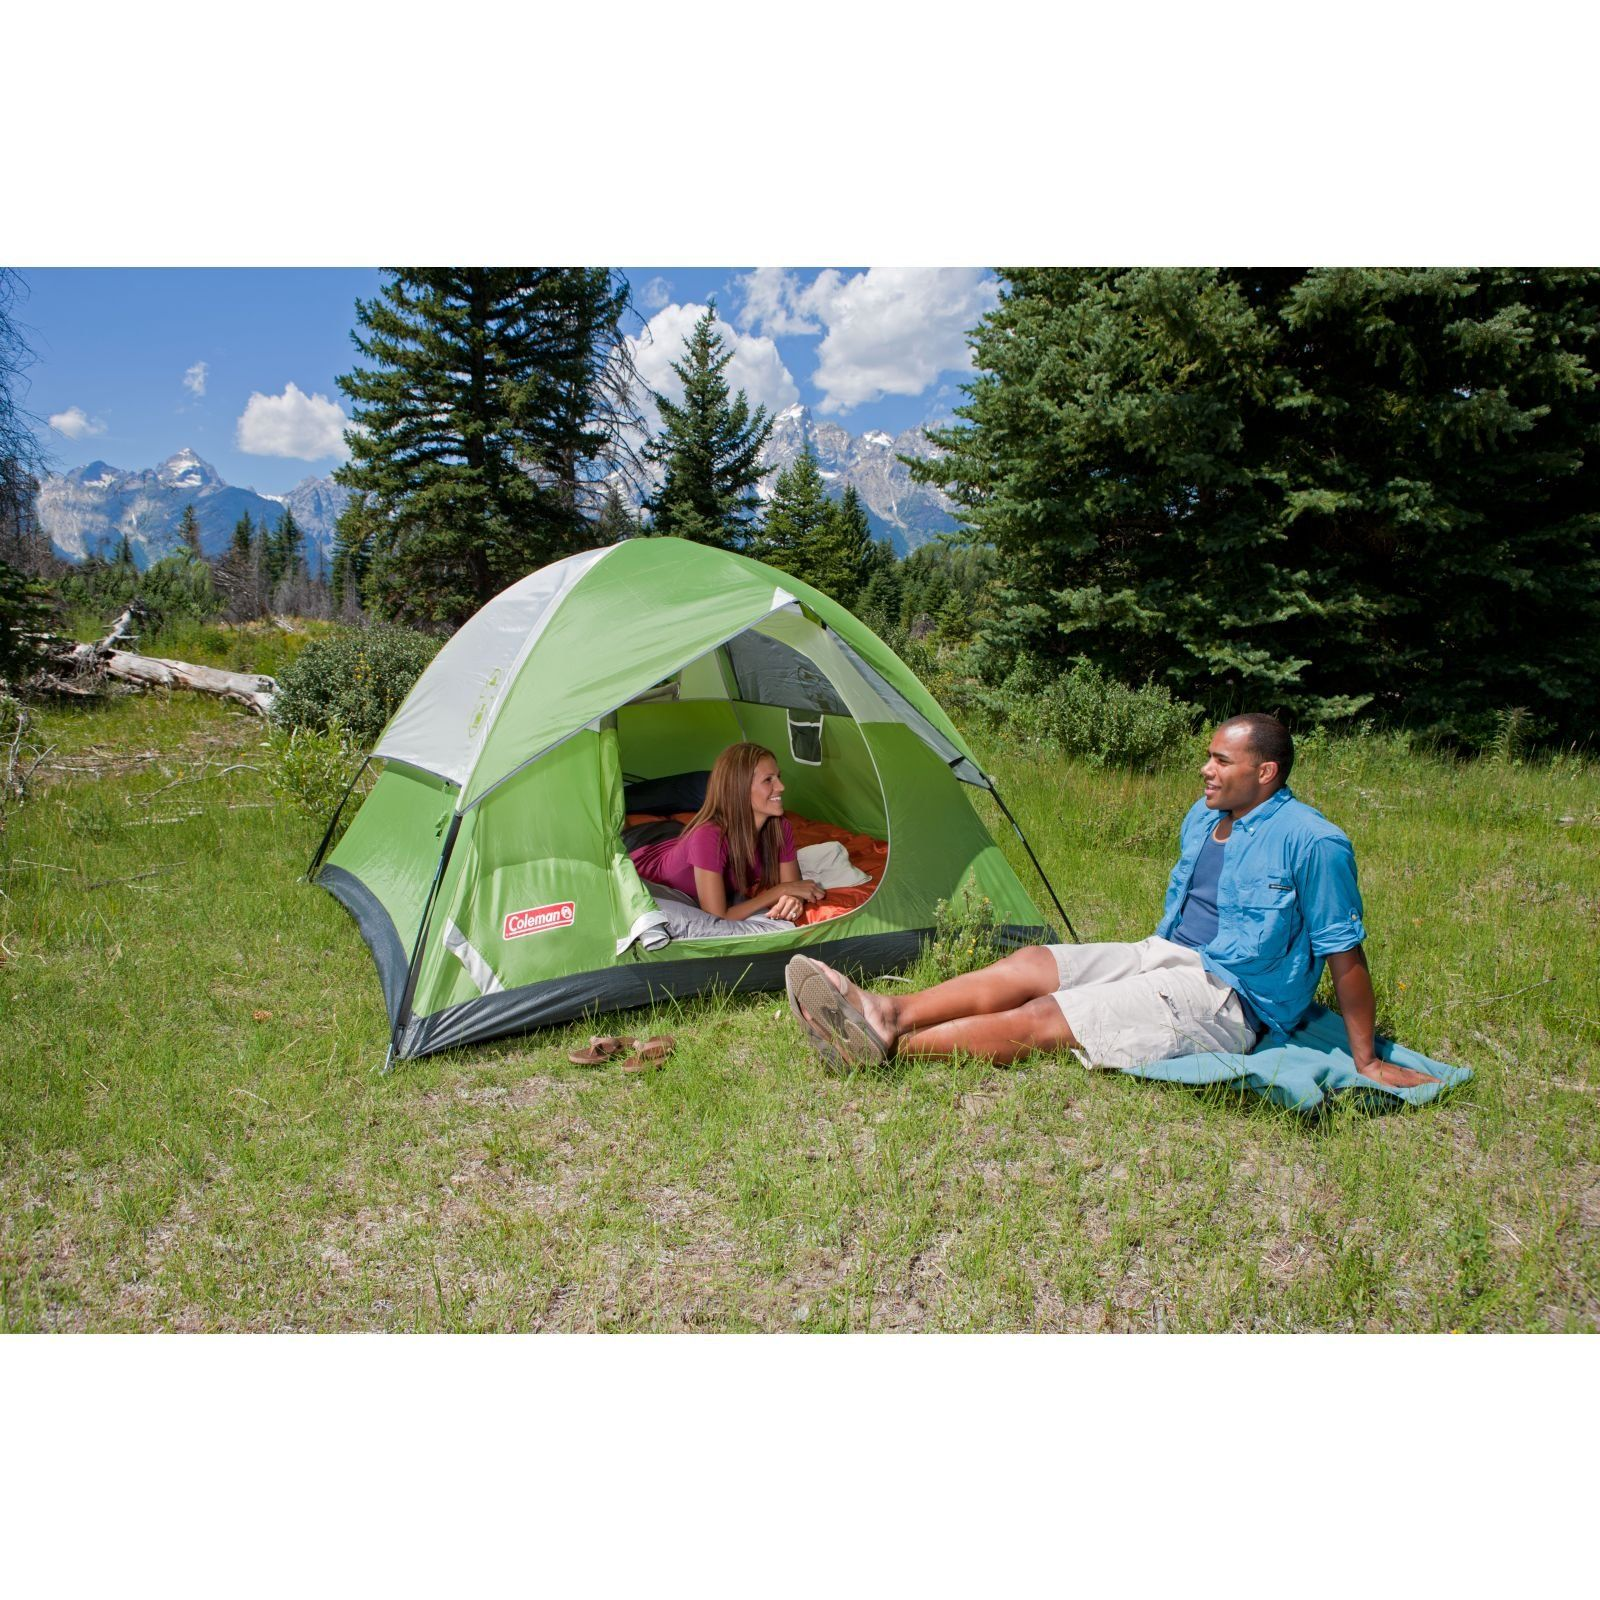 Amazon.com  Coleman Sundome Tent  Sports u0026 Outdoors  sc 1 st  Pinterest & Amazon.com : Coleman Sundome Tent : Sports u0026 Outdoors | camping ...